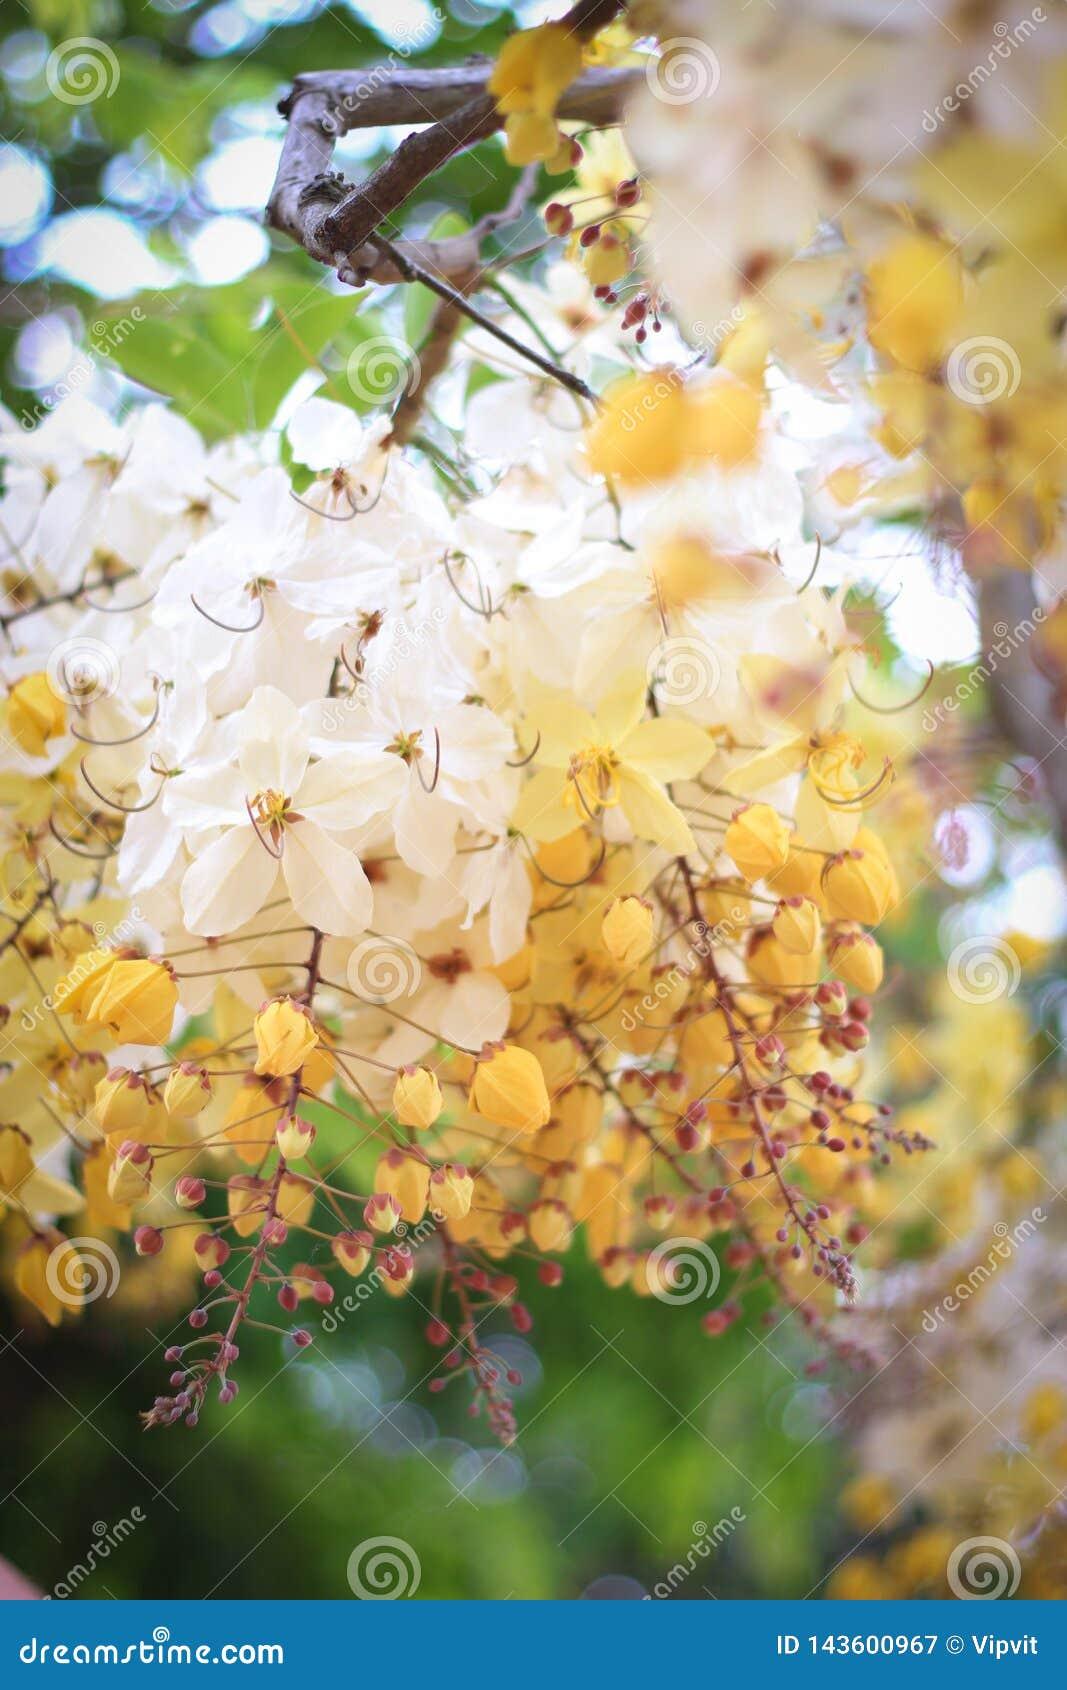 Flor del árbol de la ducha de arco iris o Ratchaphruek blanco